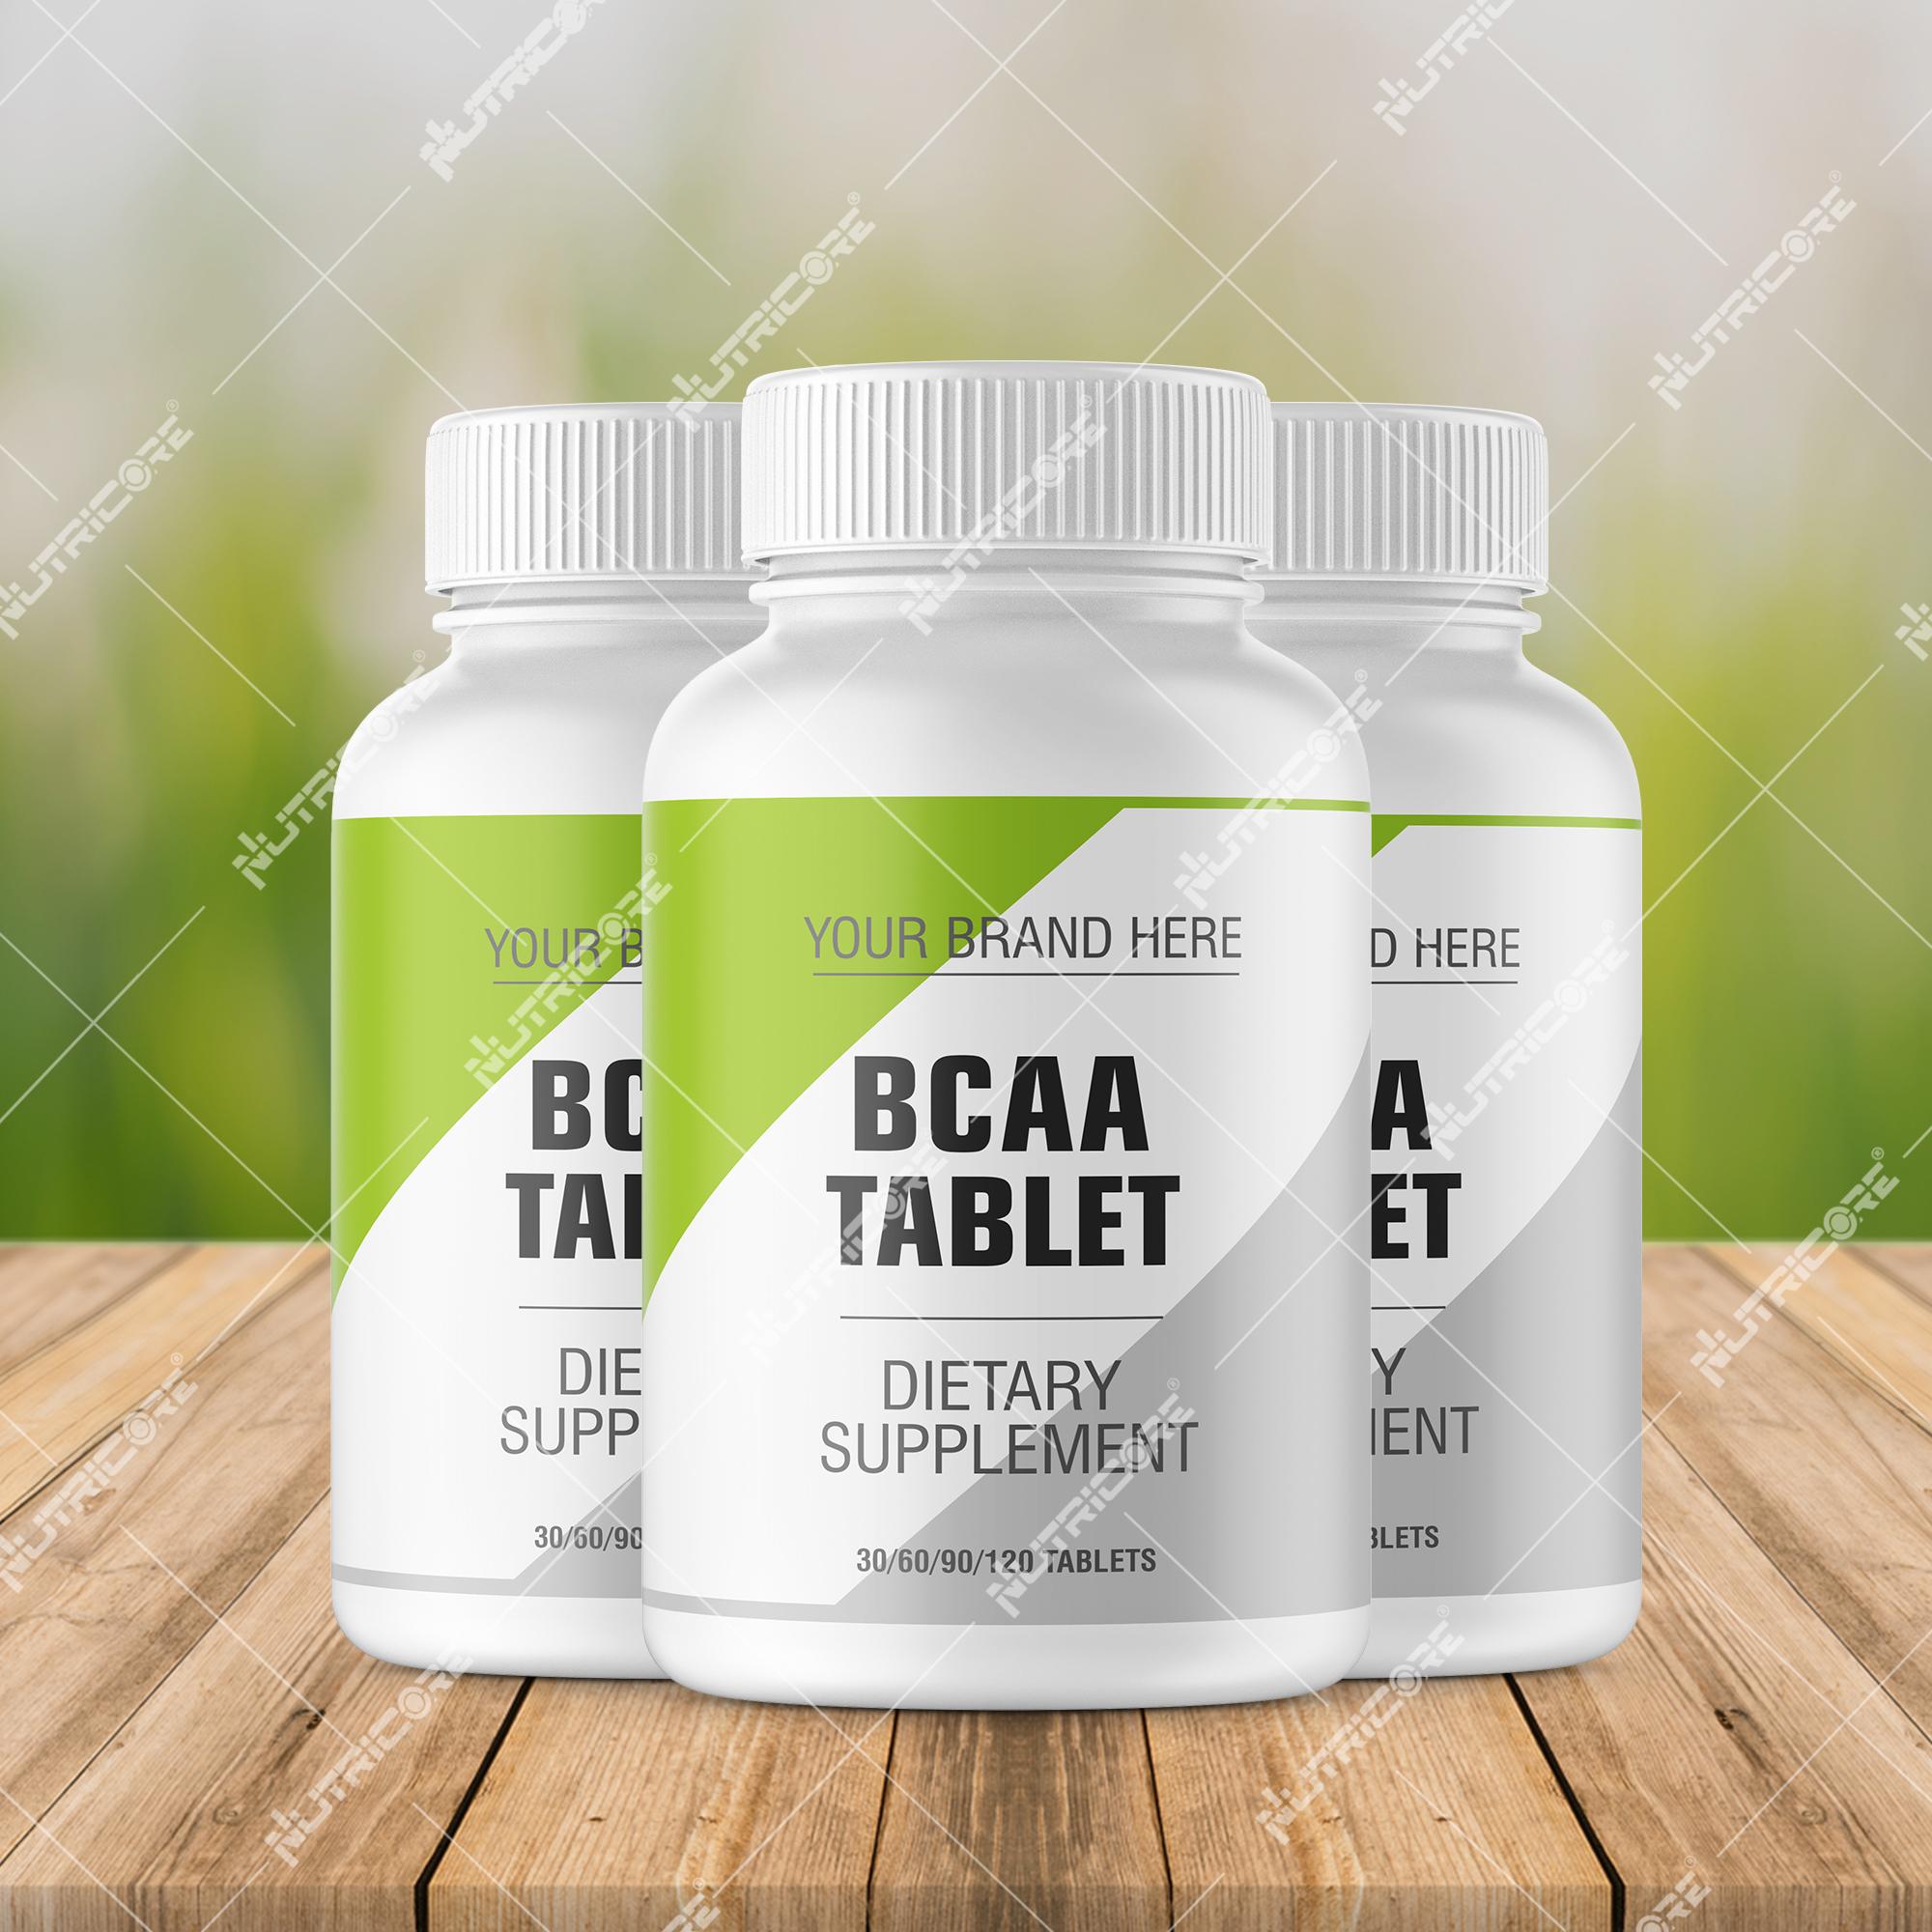 BCAA Tablet